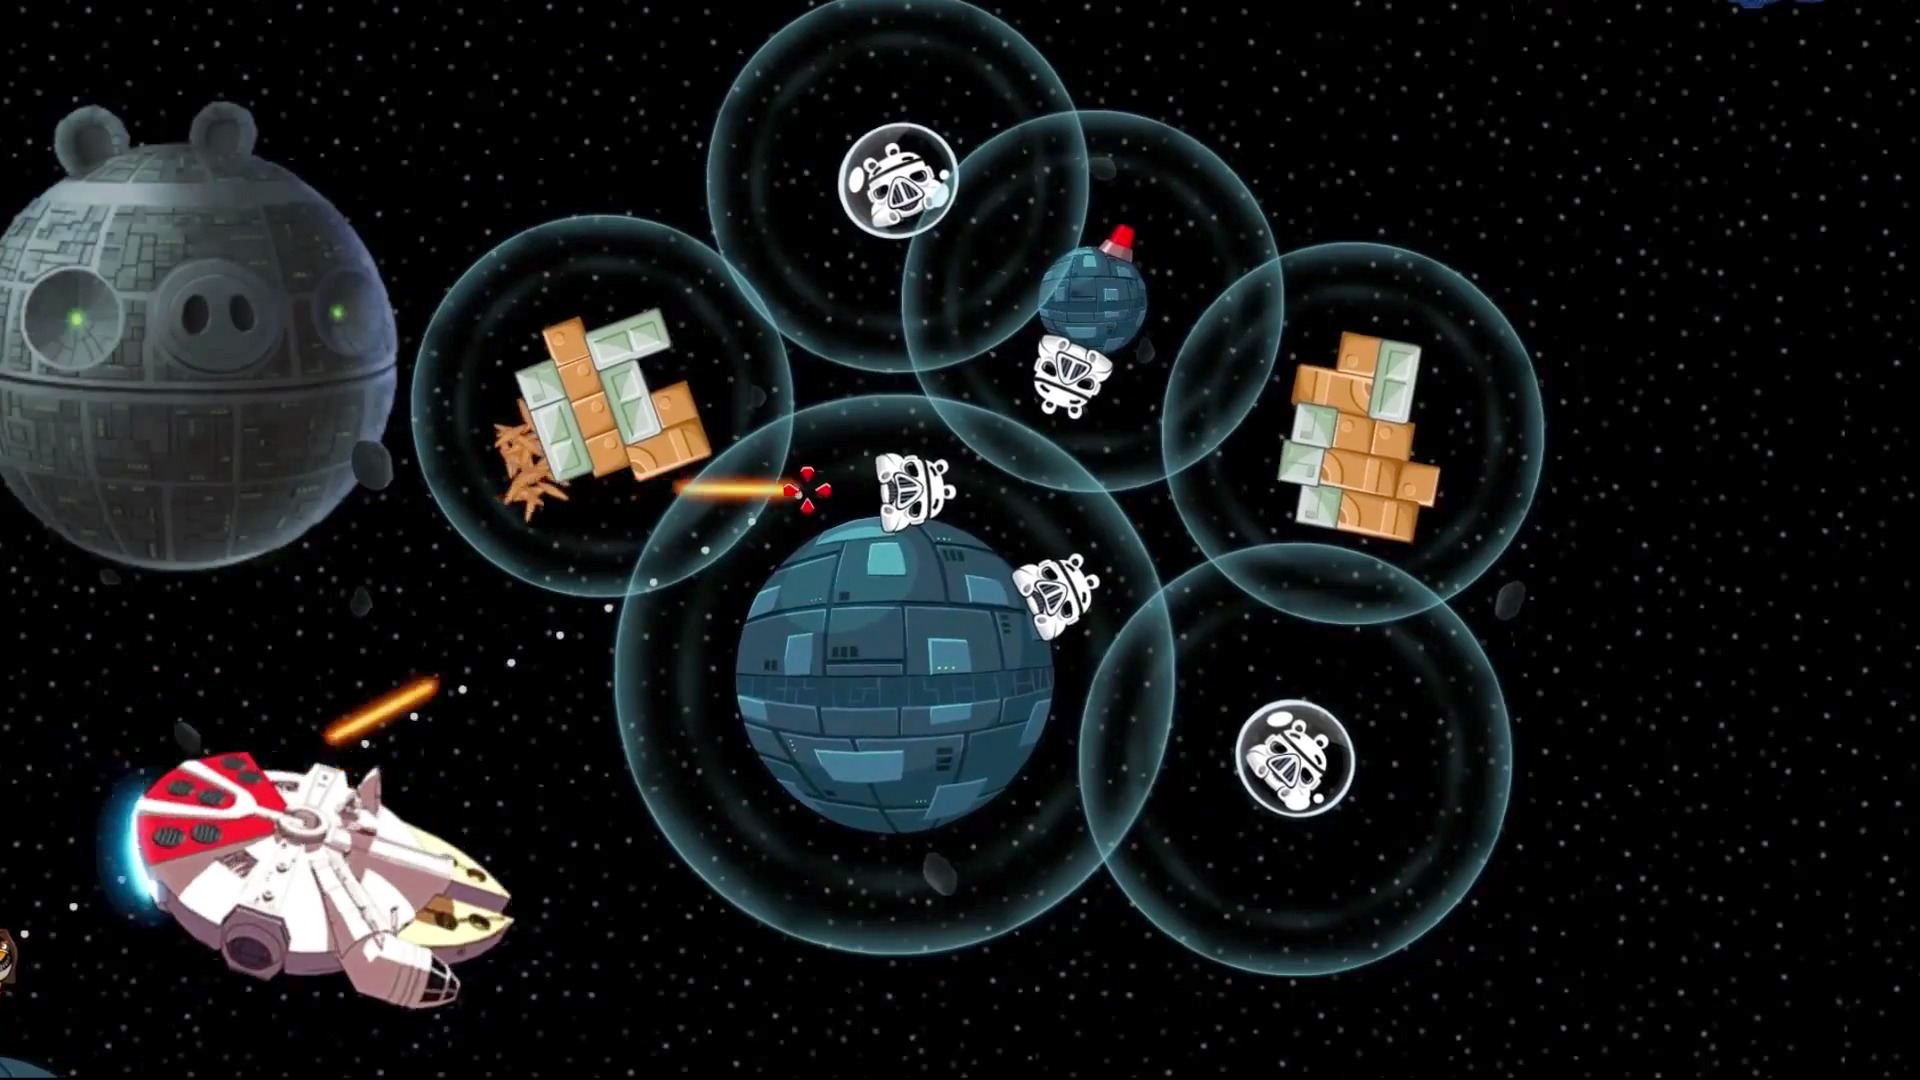 Angry Birds Star Wars wallpaper 4